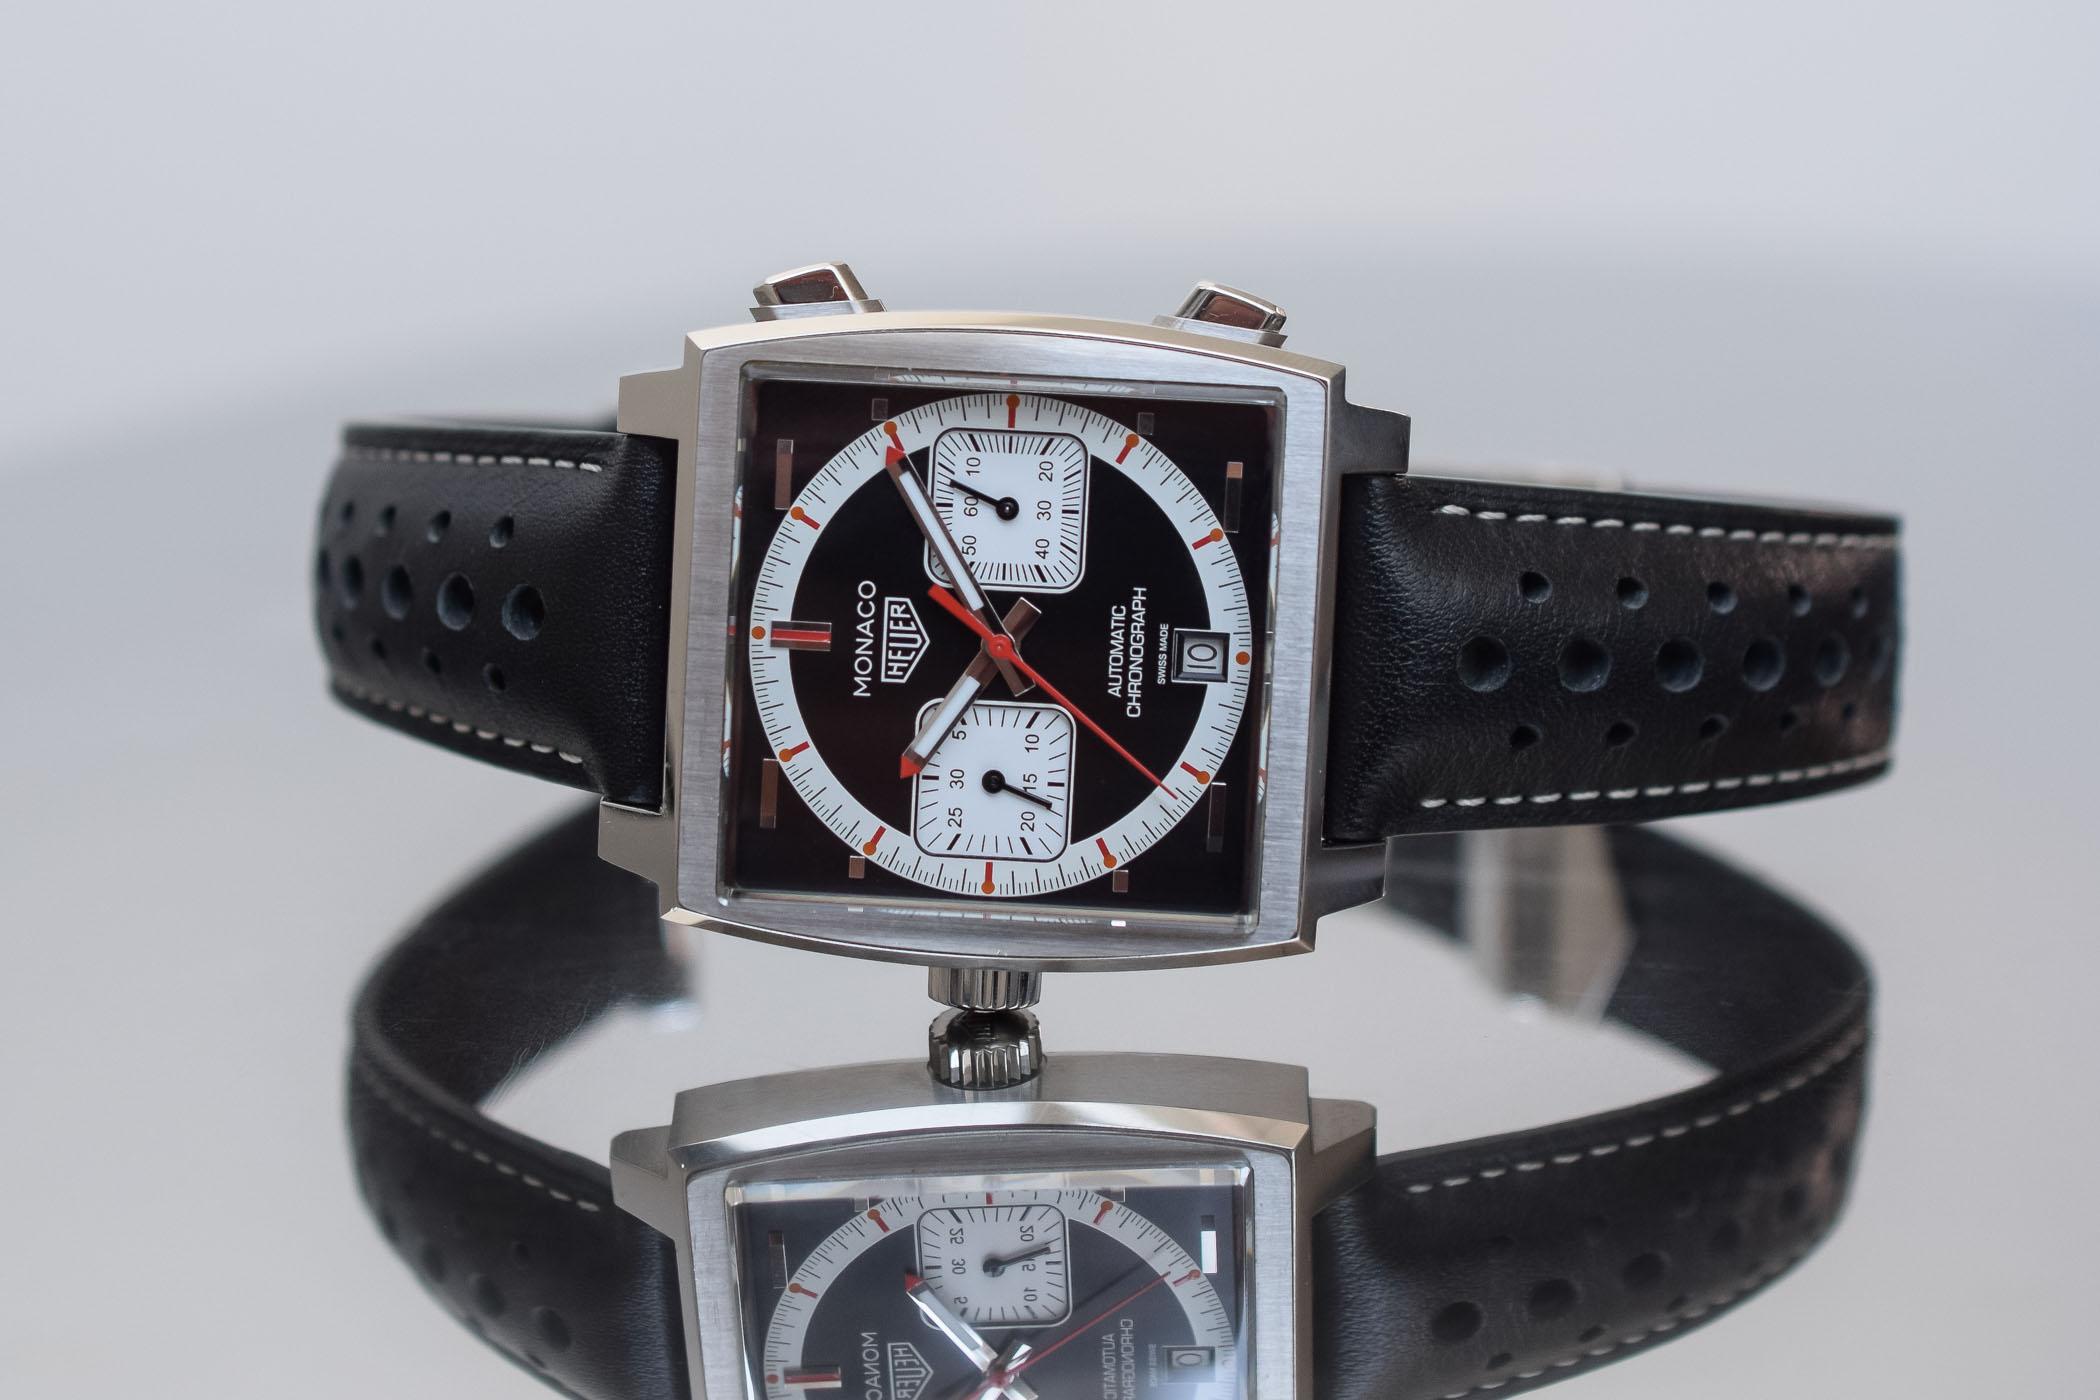 Tag Heuer horloge Monaco 4th Limited Edition 1999-2009 series met zwart leren band